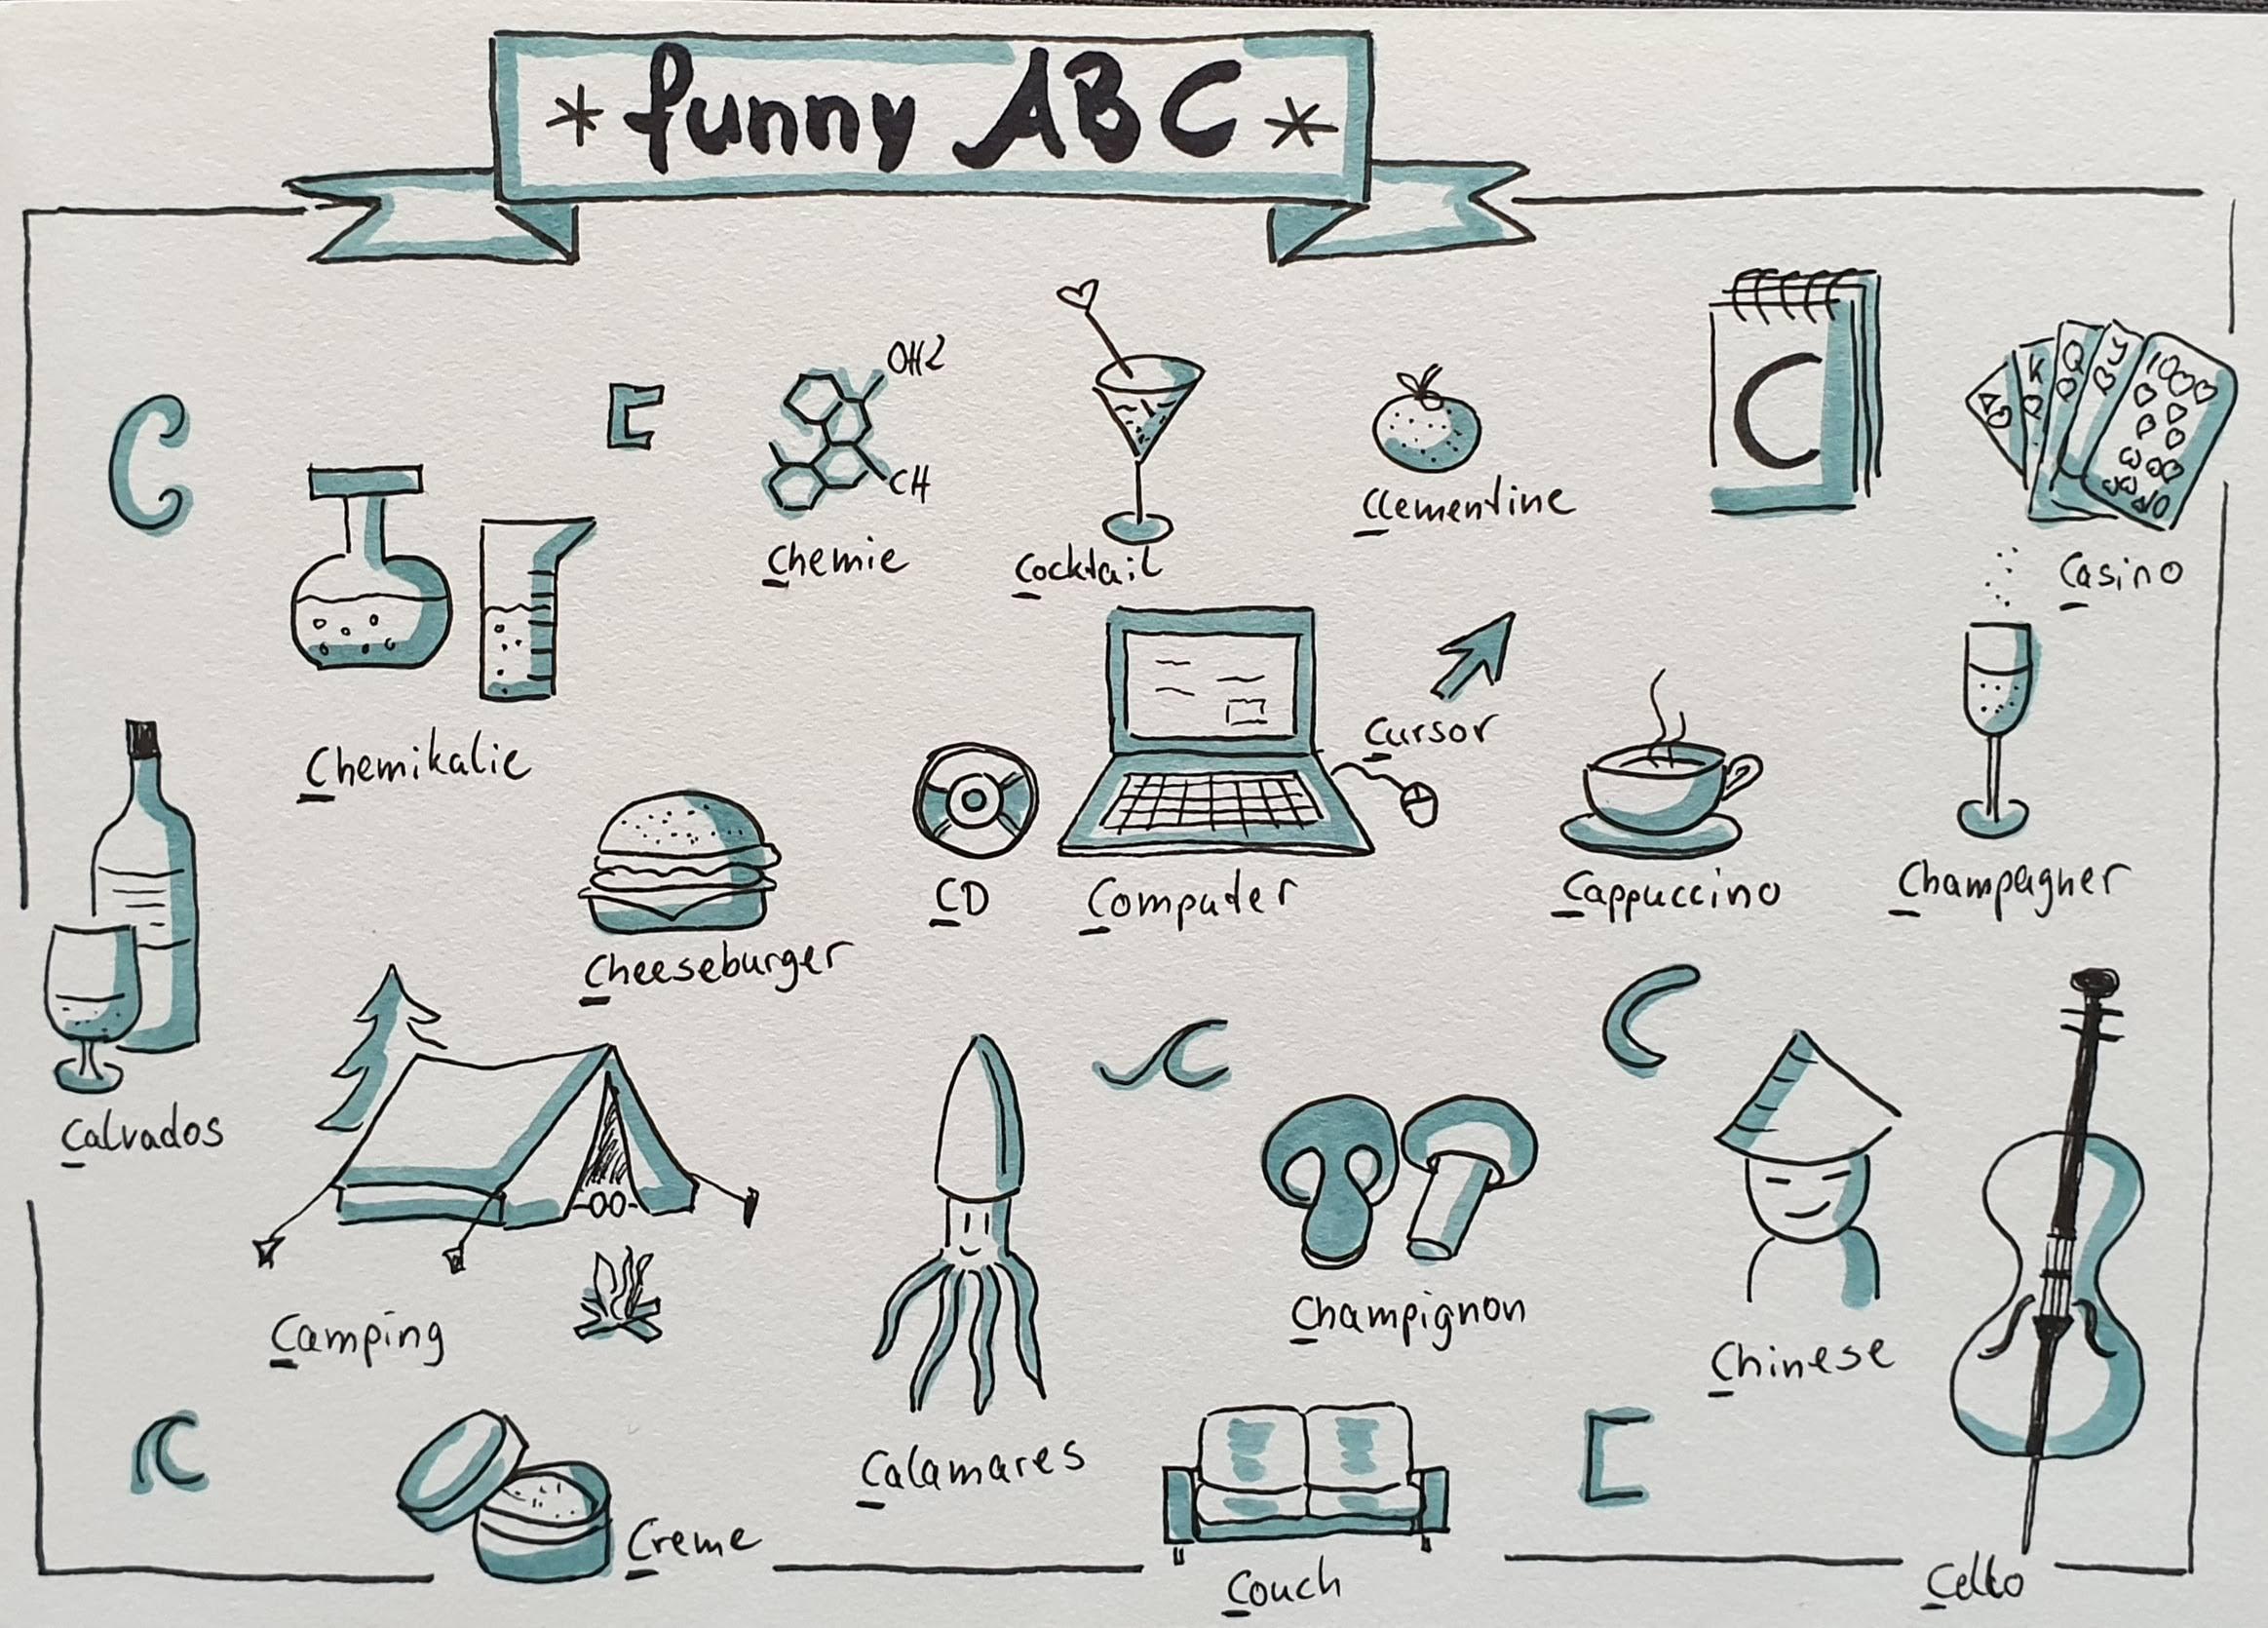 Sketchnotes Funny ABC - C